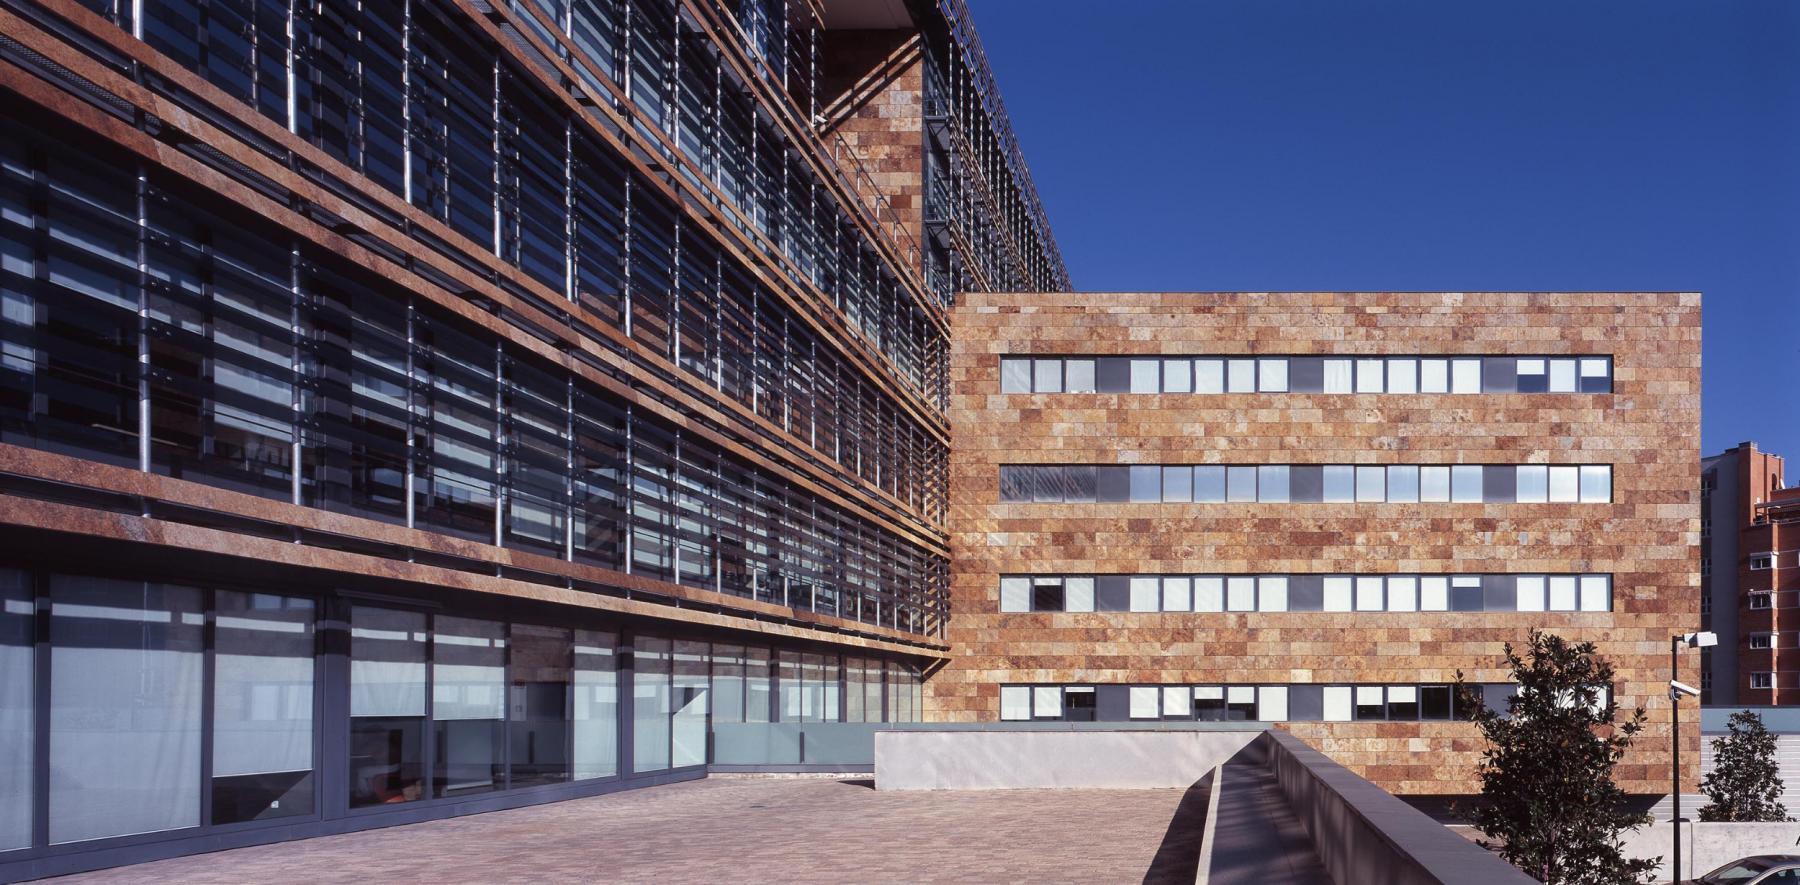 Alquilar oficinas Calle de Isabel Colbrand 22, Madrid (1)